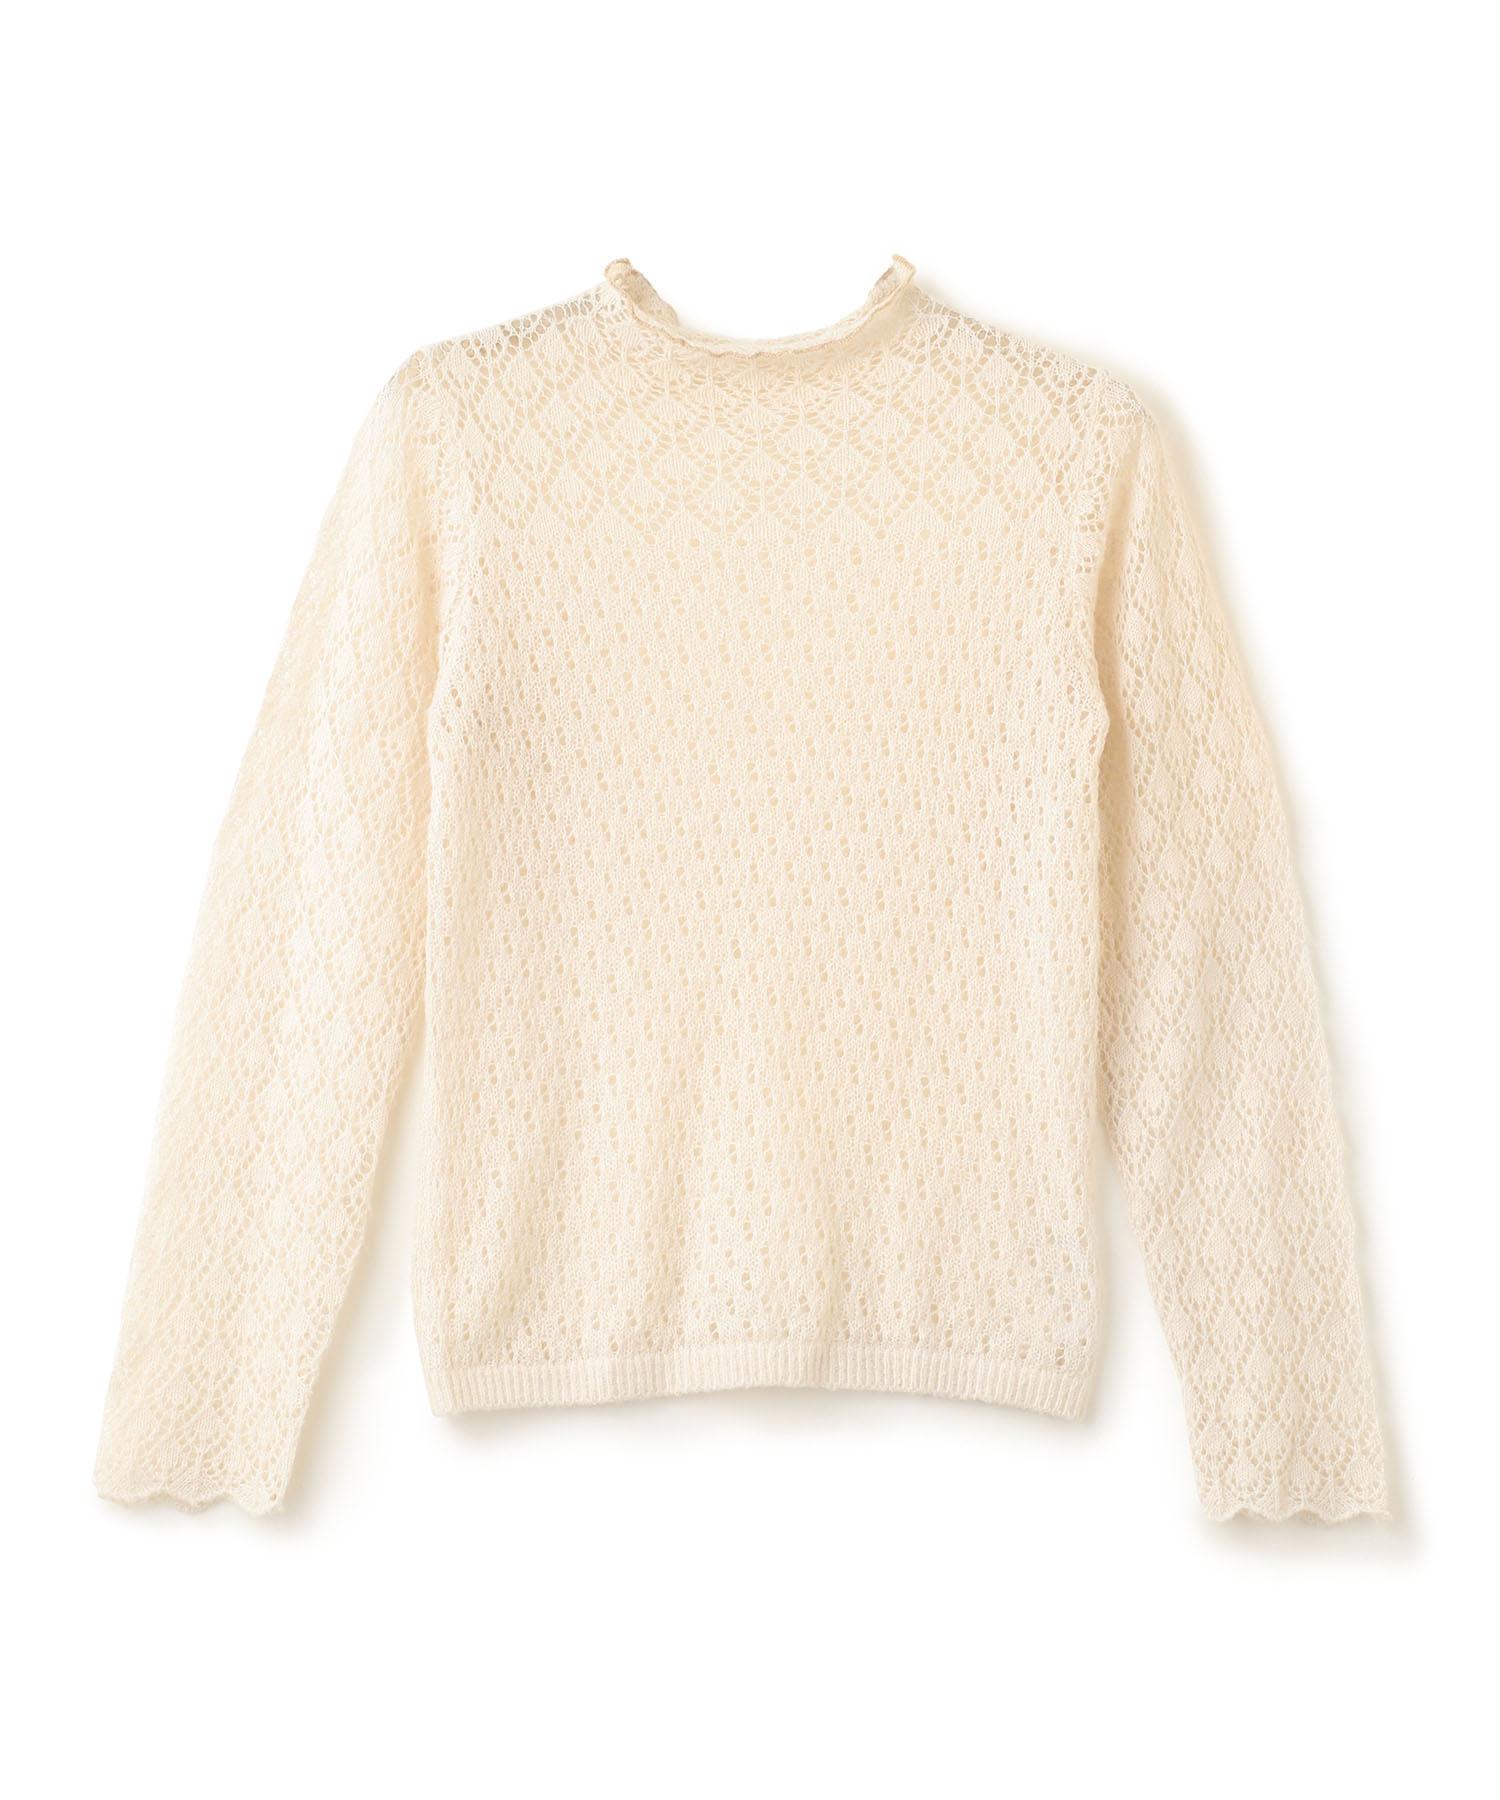 Eyelet Mix Knit Pullover